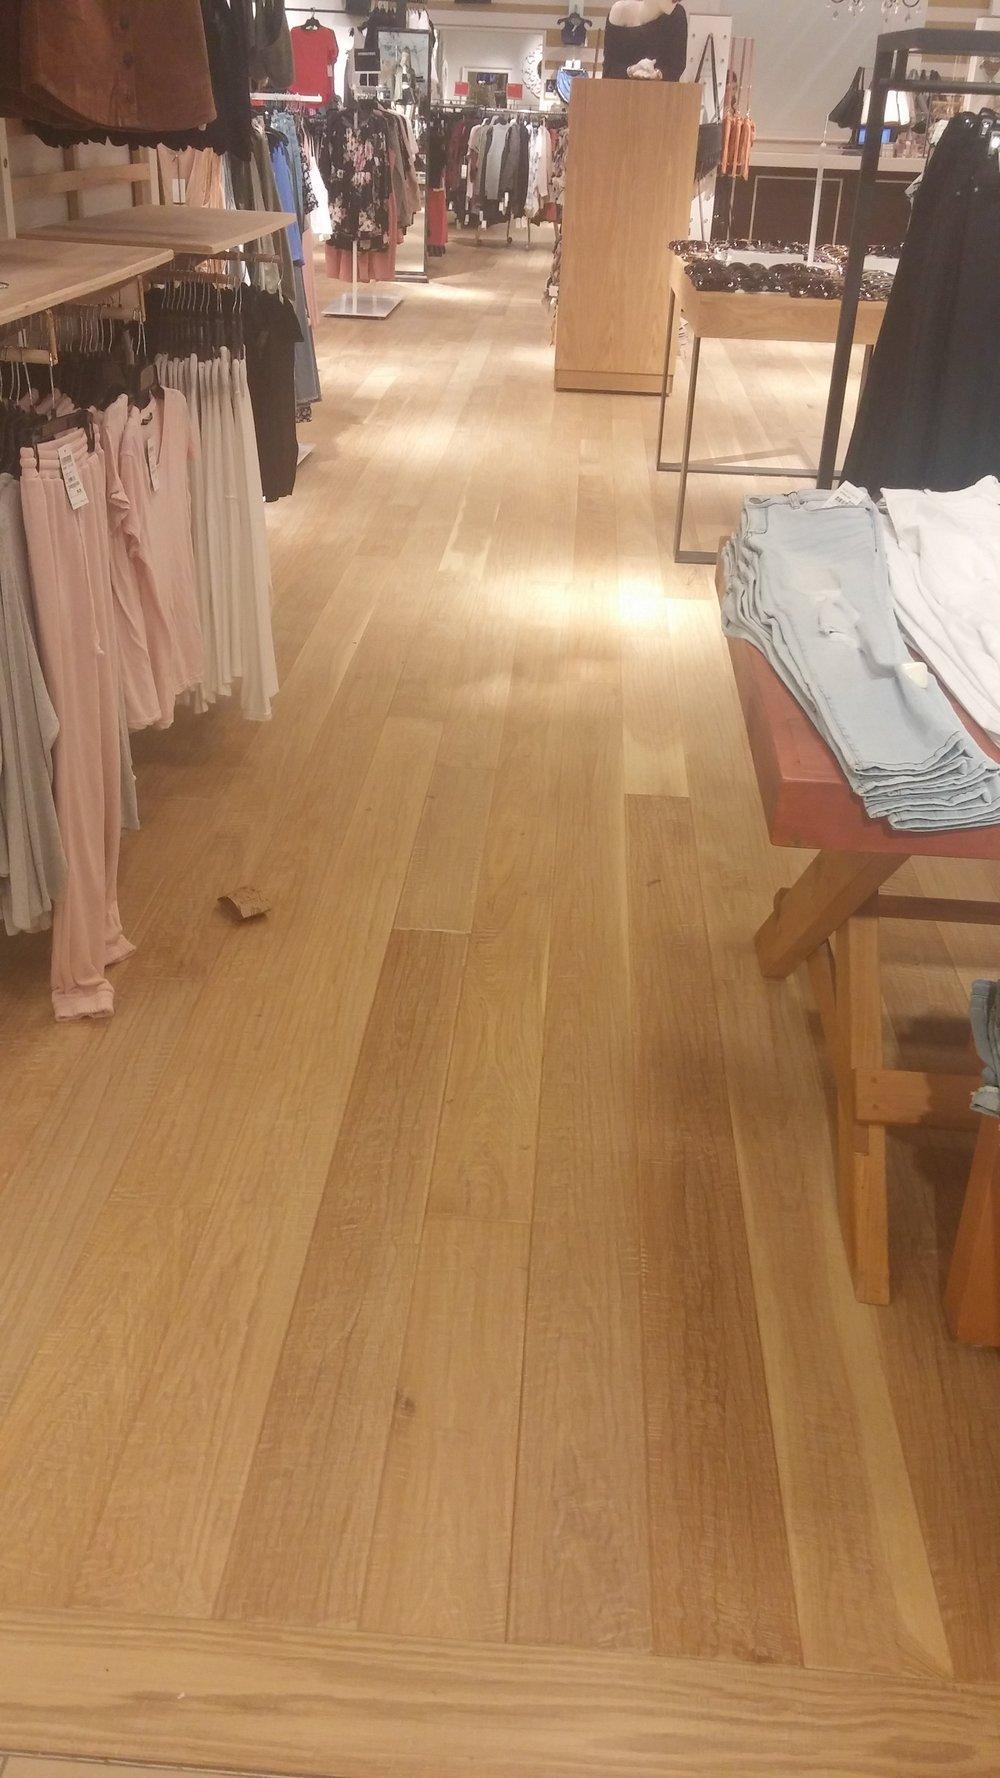 Major Retail-0018.jpg